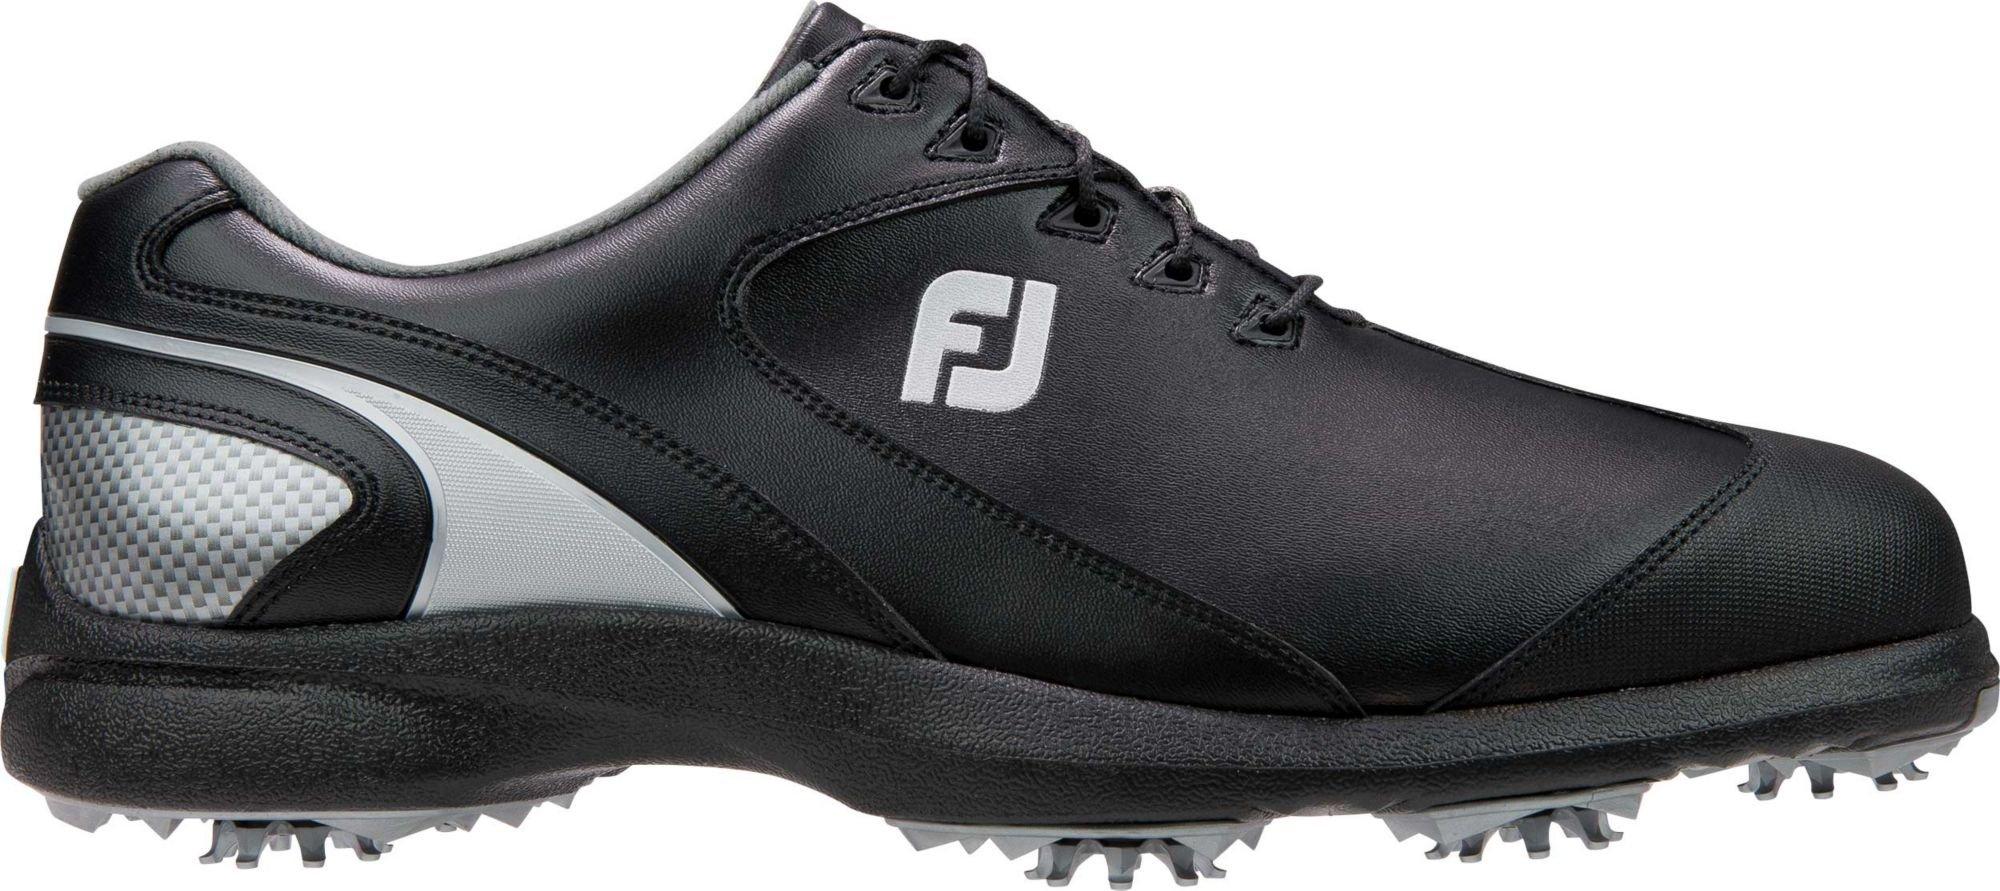 FootJoy Sport LT Golf Shoes